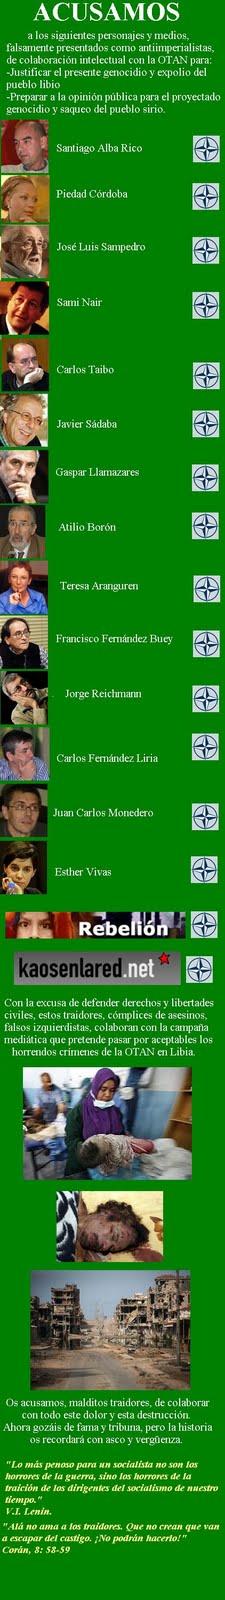 (Reformismo-leninismo) ¿Qué hacer en Andalucía? [Alberto Garzón] - Página 2 Blogacusamos